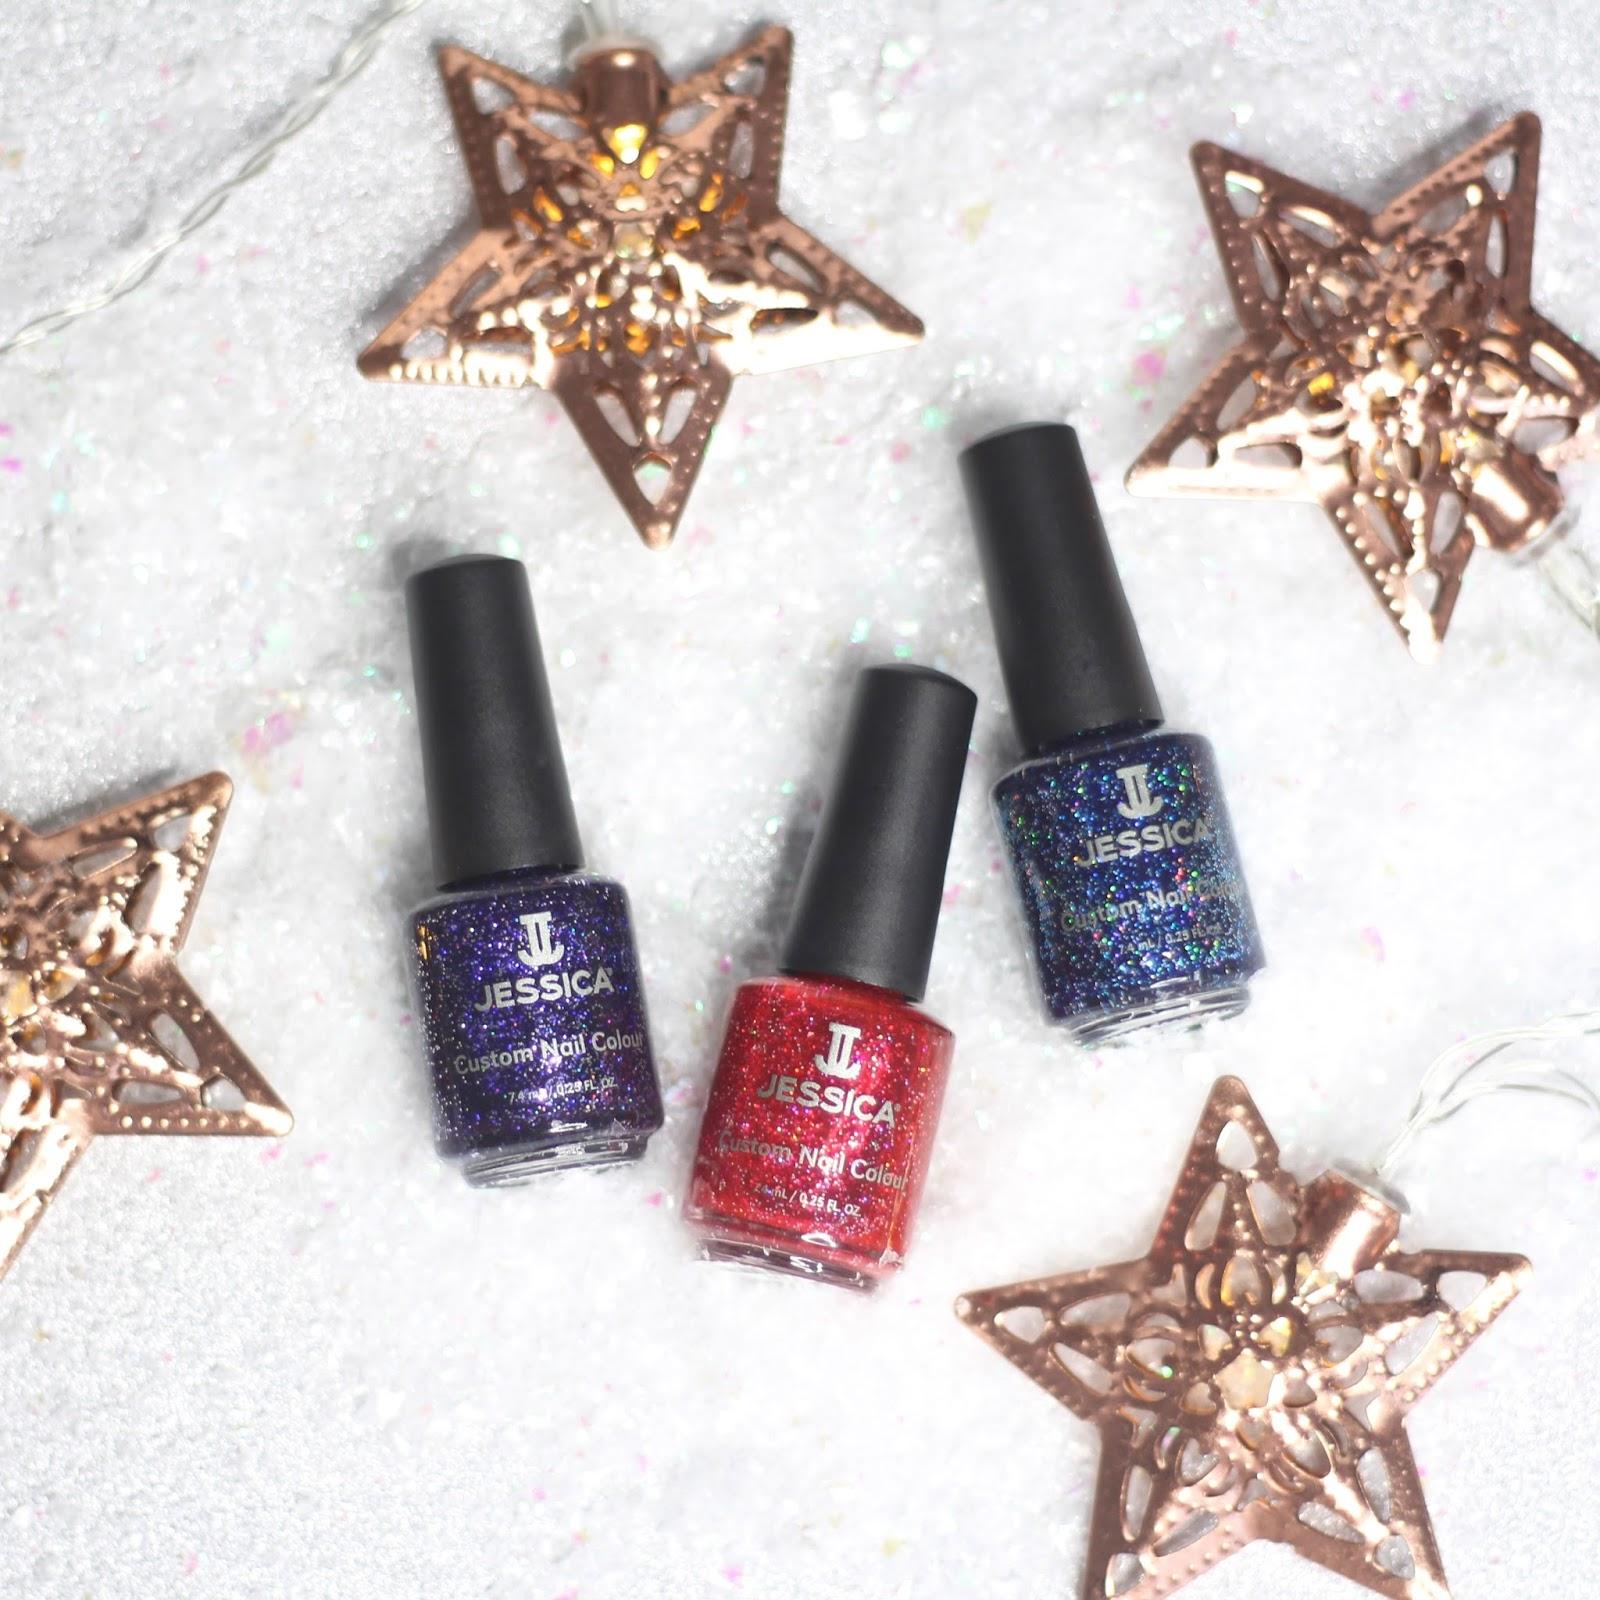 Jessica Christmas Nails: Christmas Gift Guides 2016